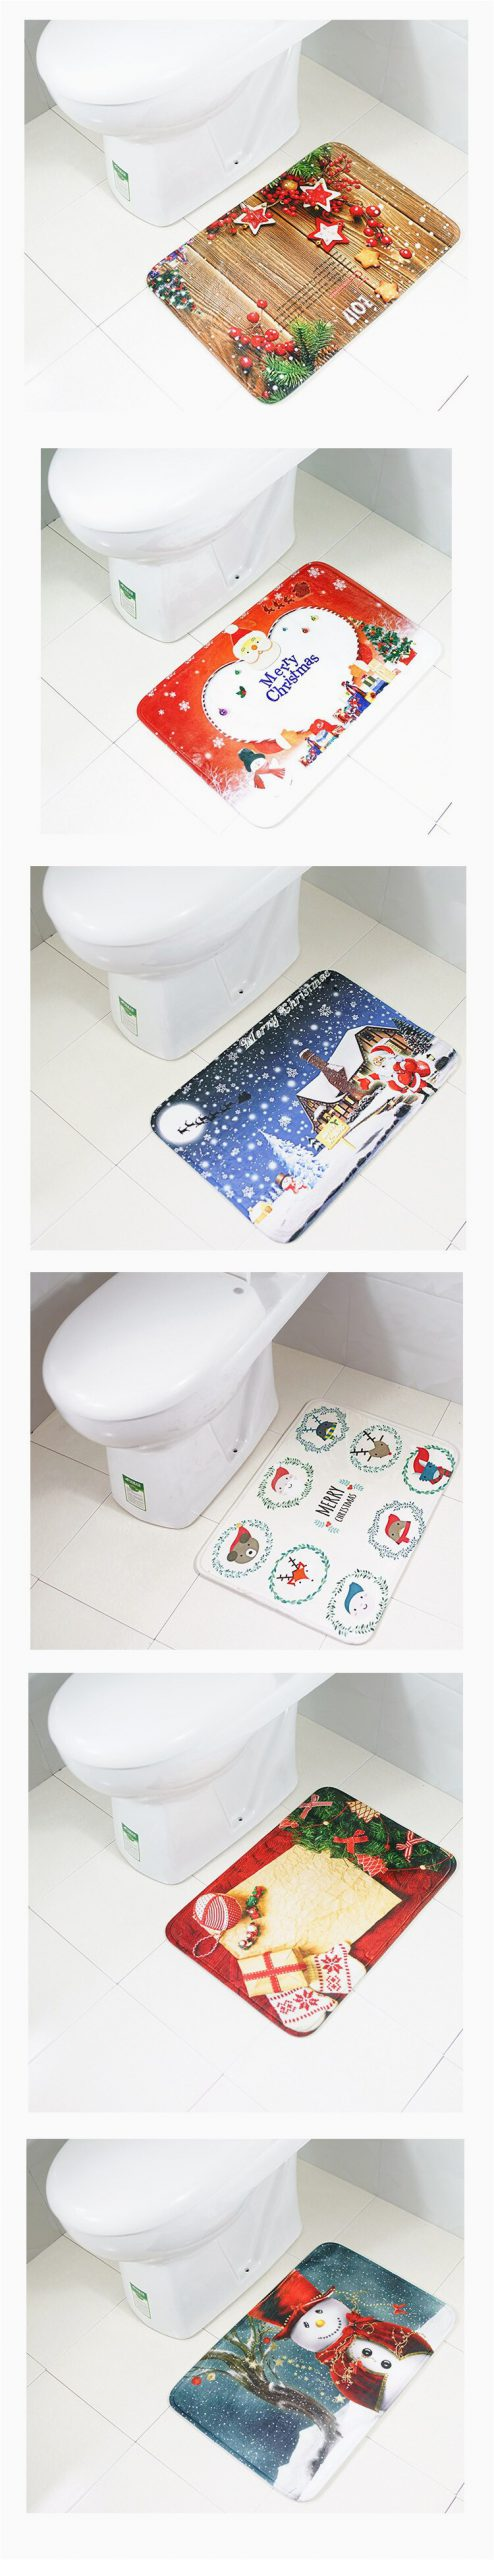 Christmas Bath Rugs Accessories Christmas Decorating Carpet Bath Rug toilet Mat Antiskid Doormat toilet Accessories Decoration Home Rugs for Kitchen La Alfombra